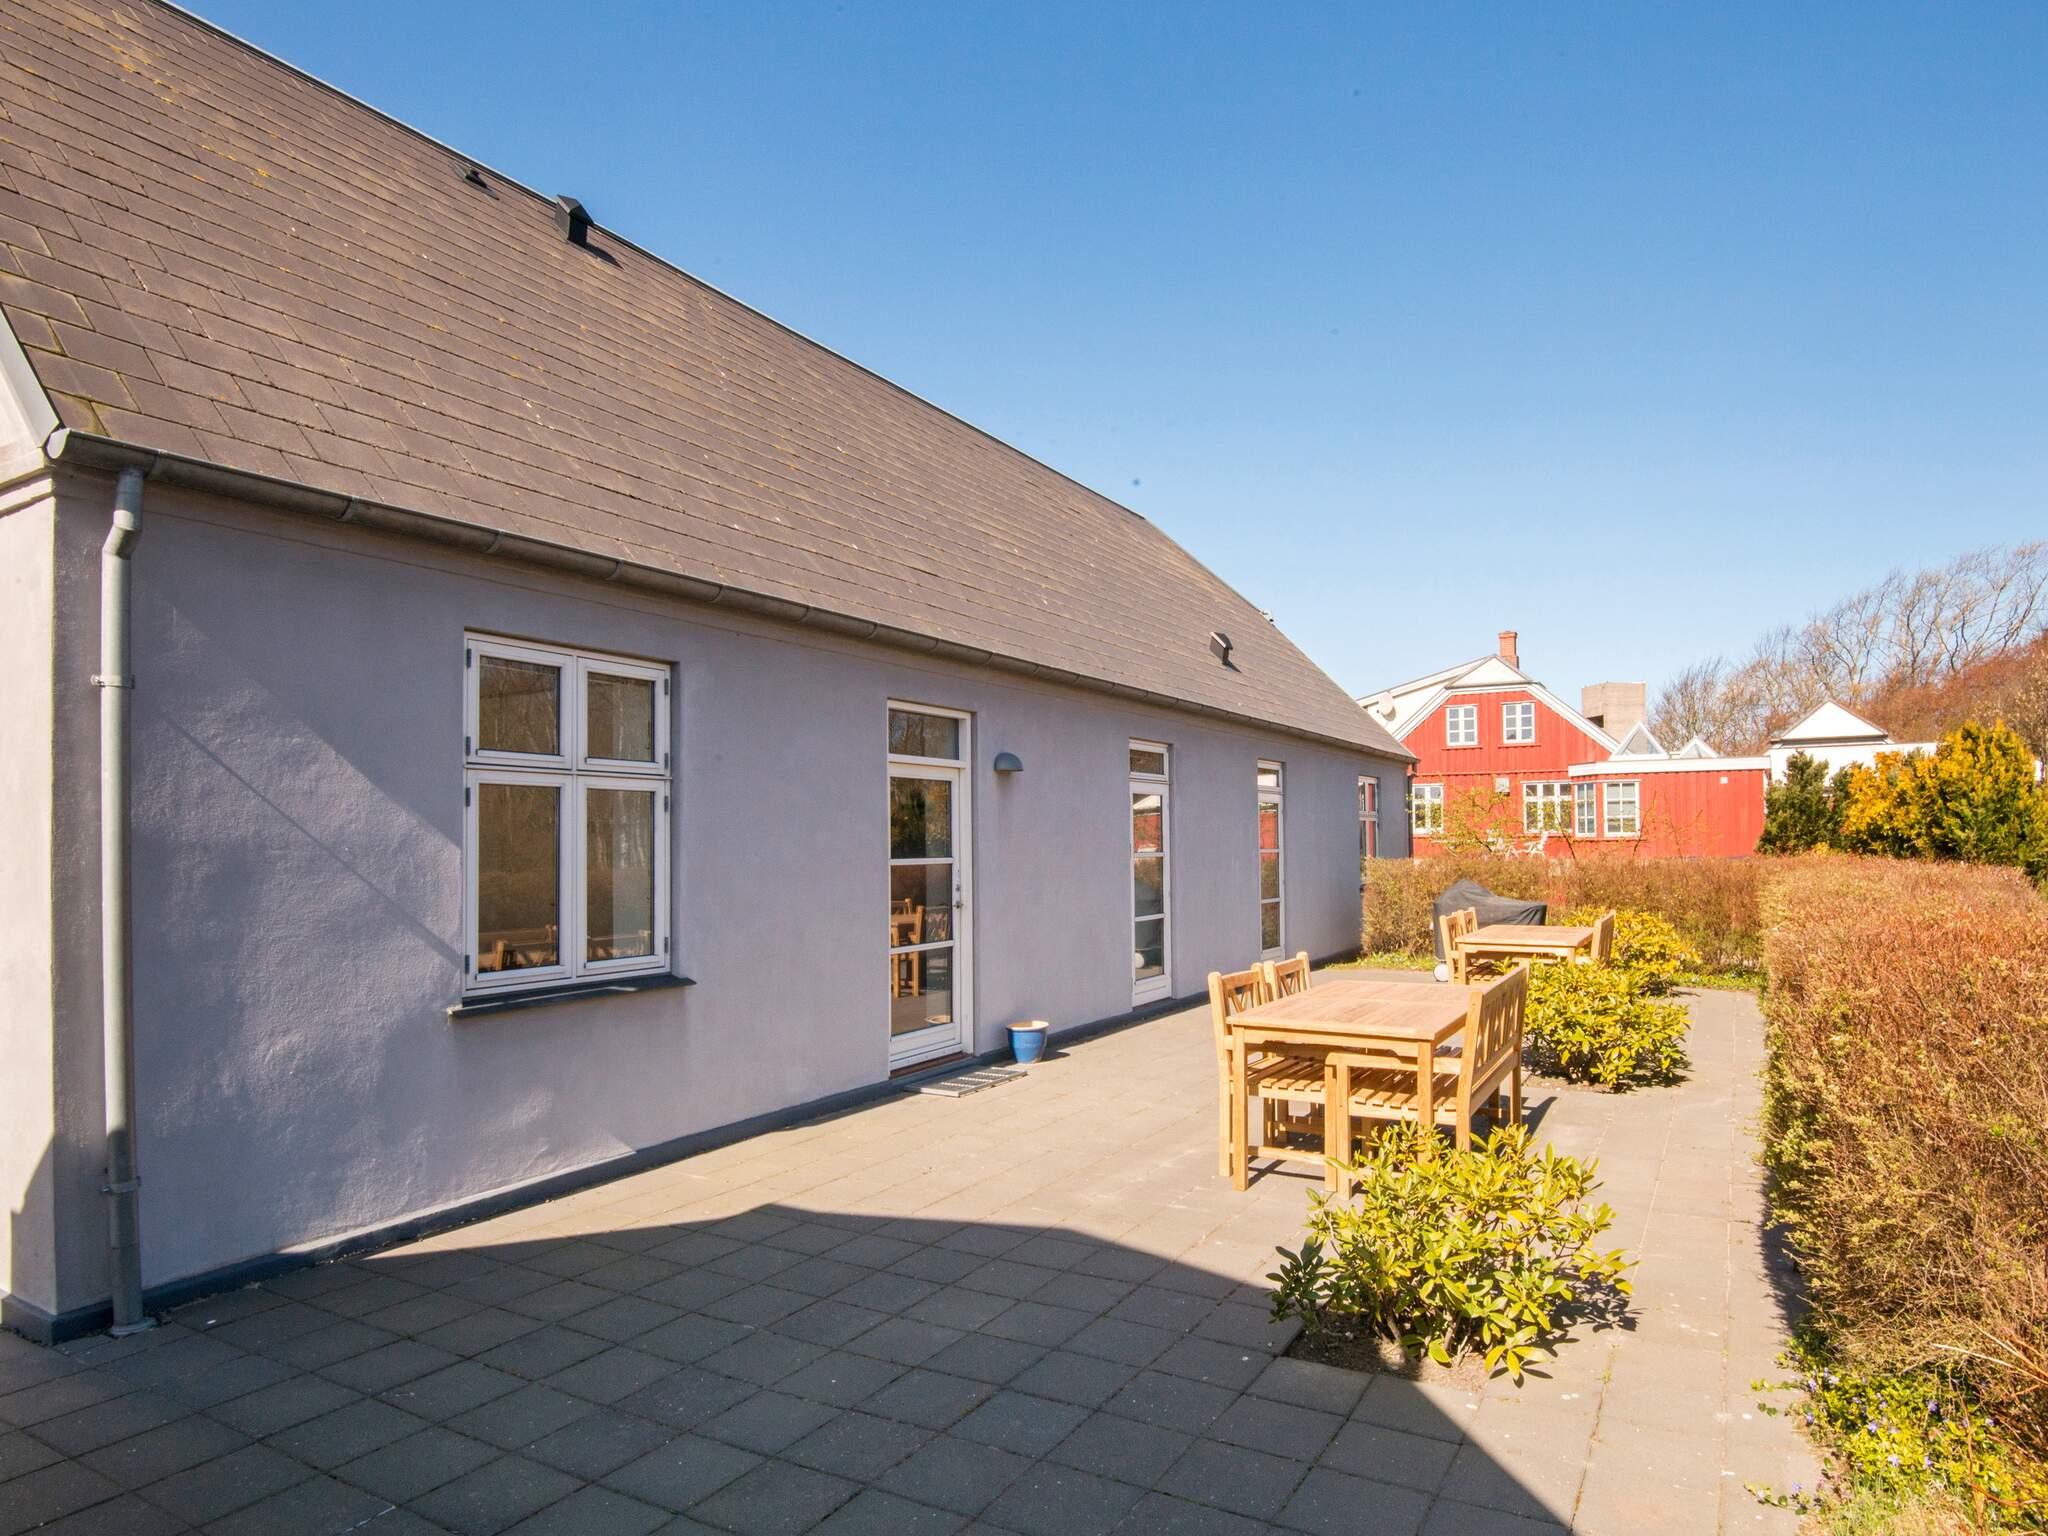 Maison de vacances Helgenæs (590964), Knebel, , Mer Baltique danoise, Danemark, image 24